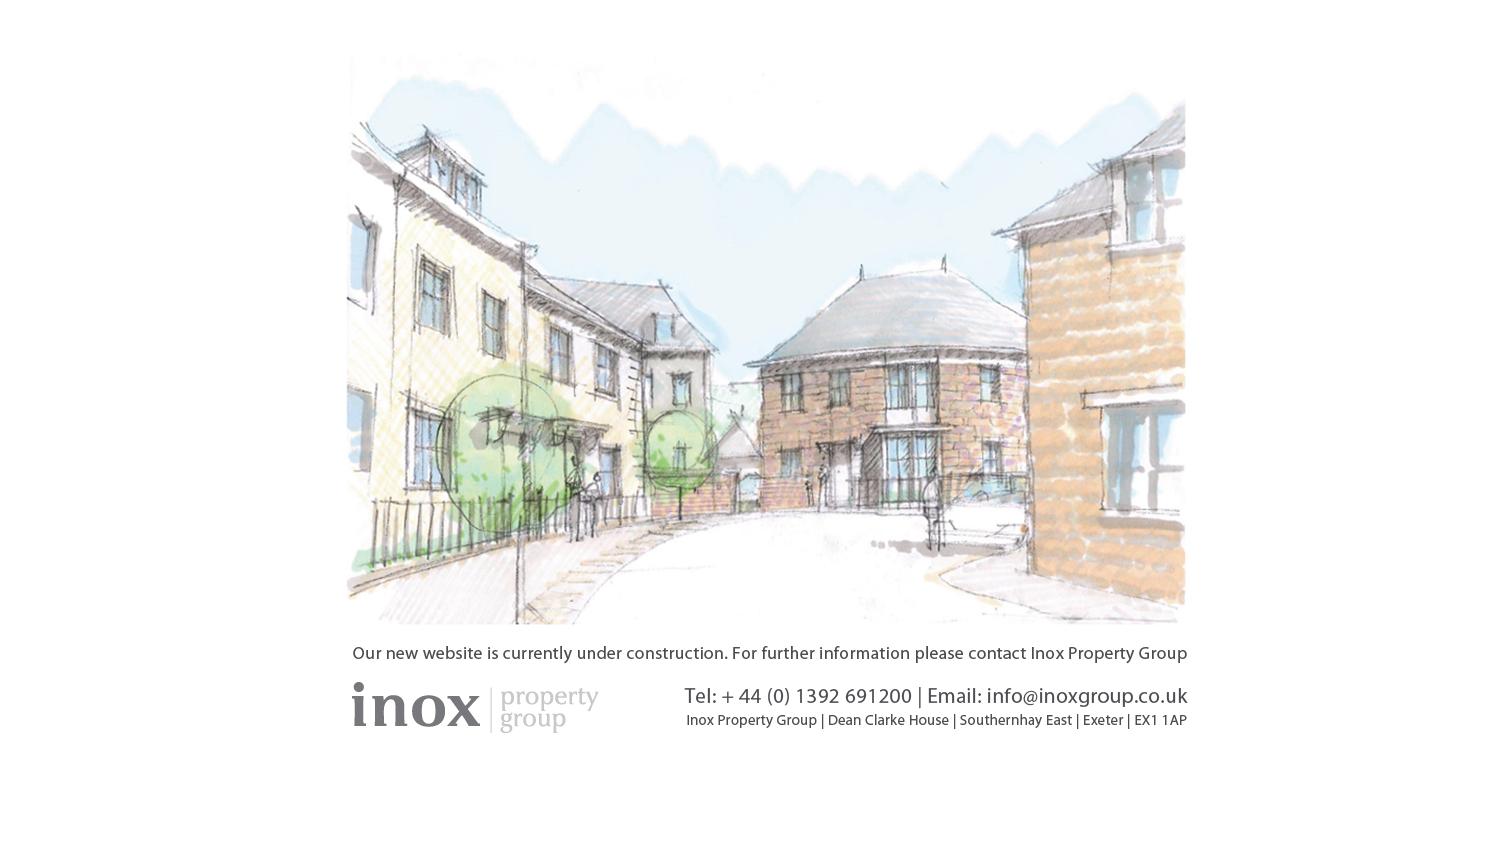 inox-holding-page